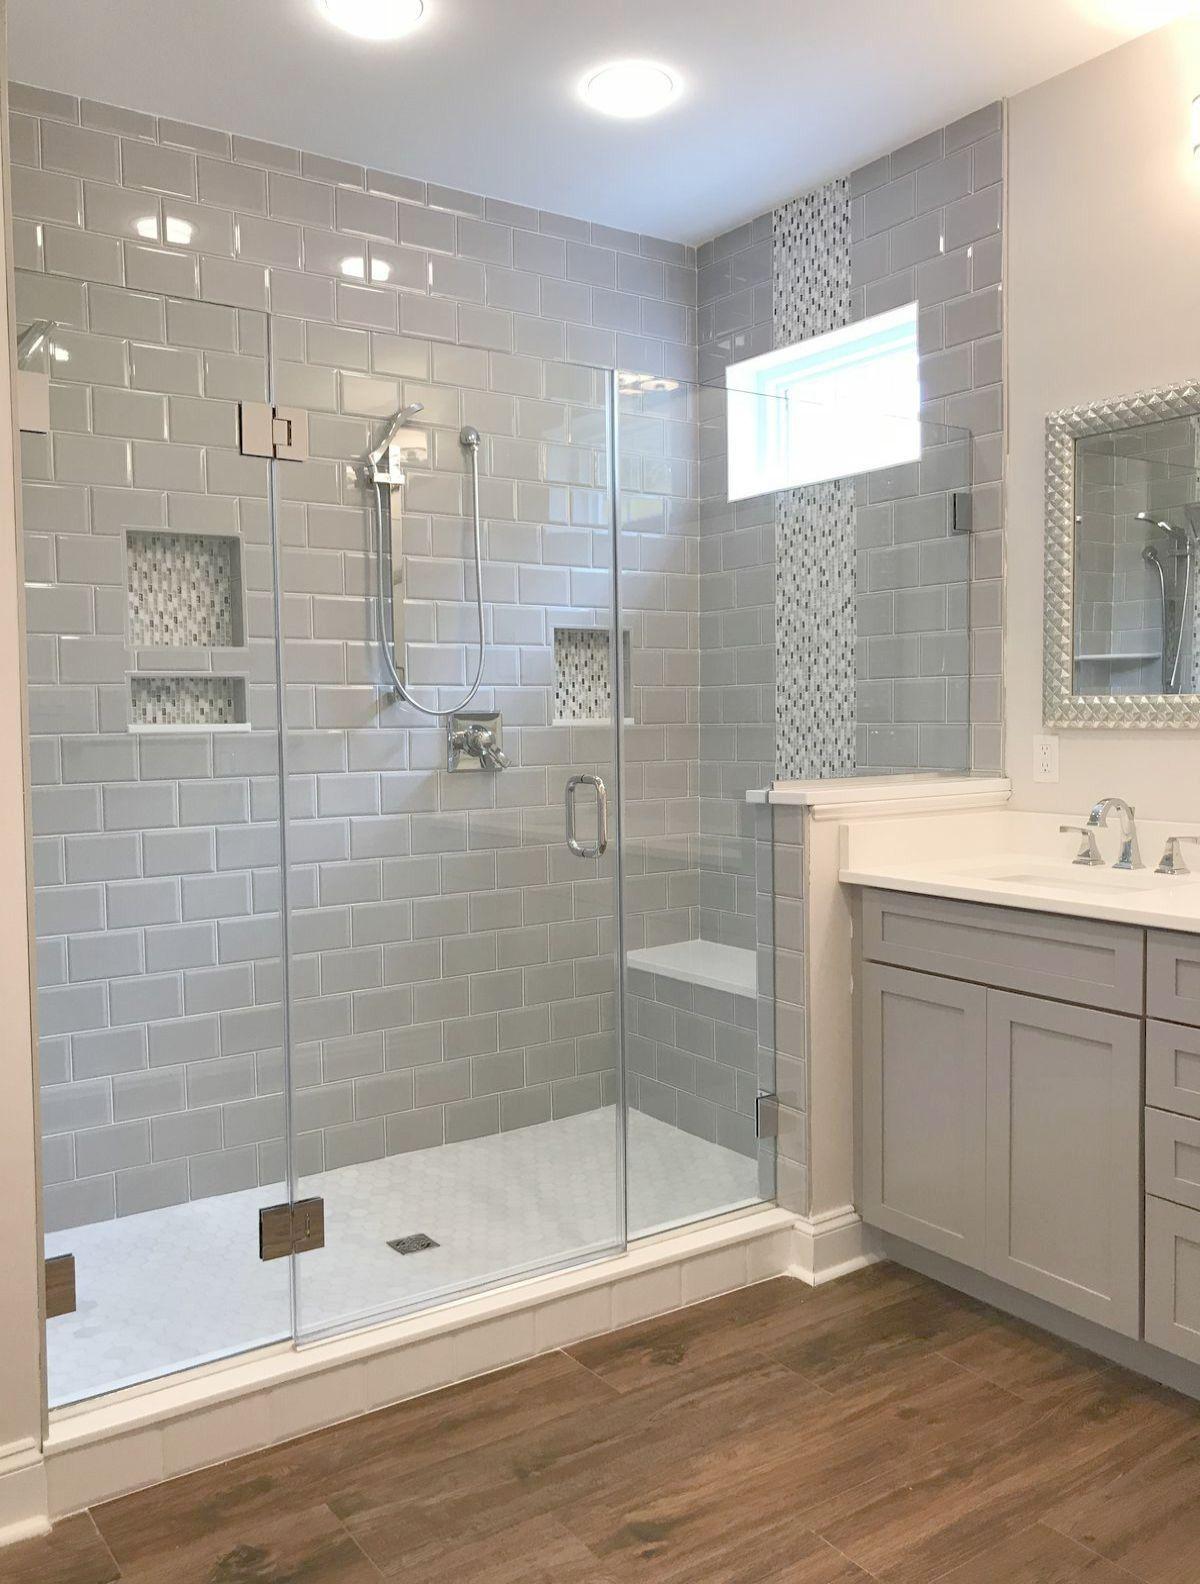 Ideal Bath Bronze Bathroom Accessory Set, 8-Piece Set Includes